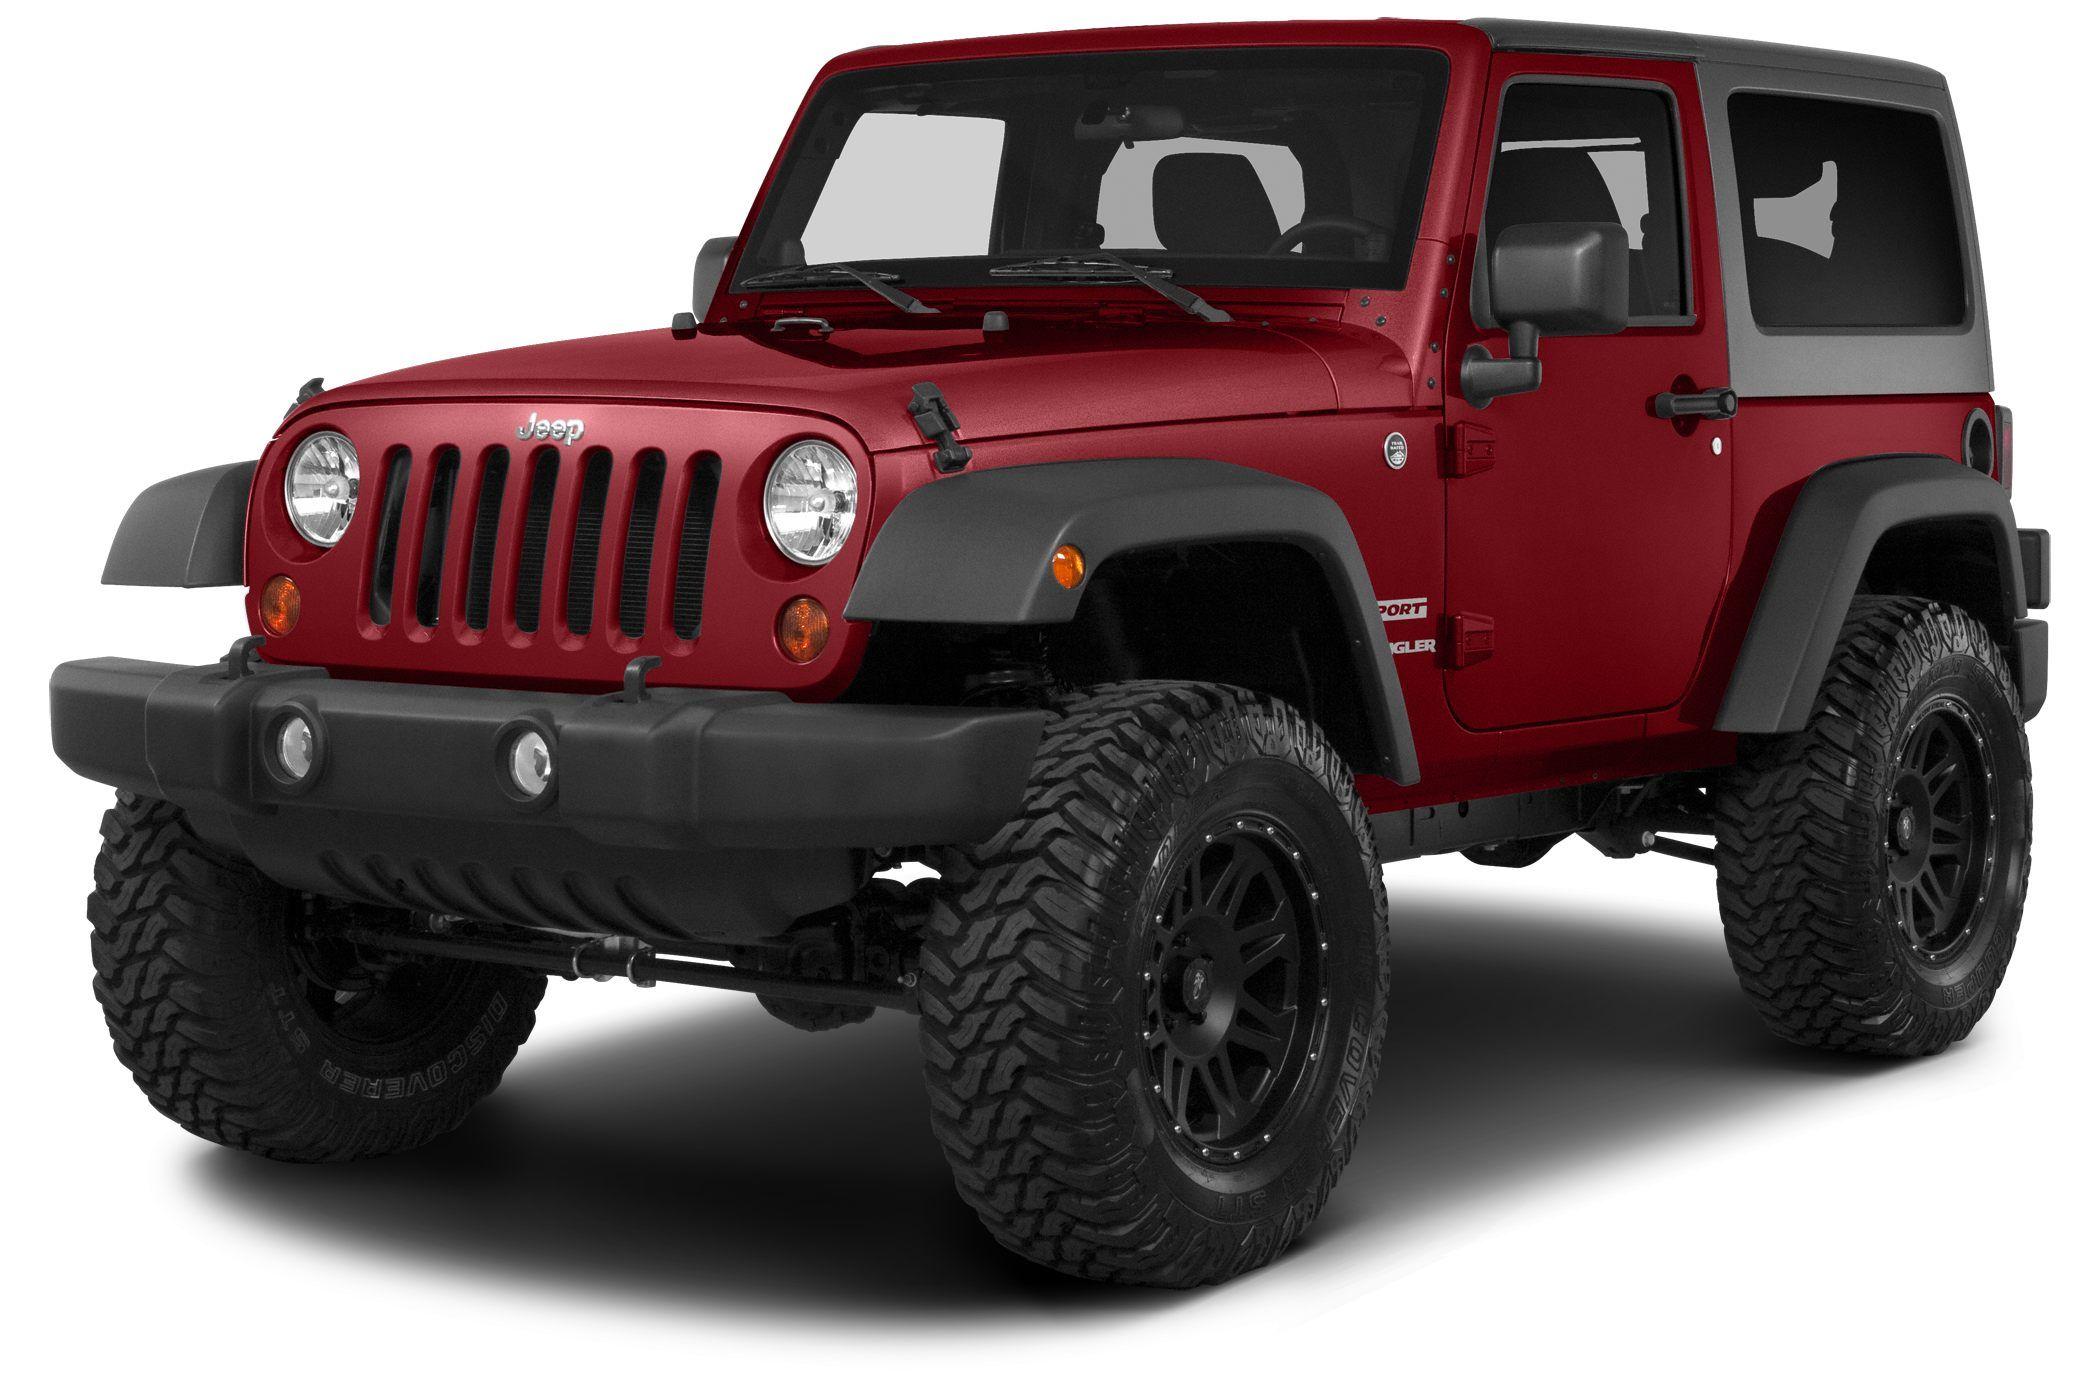 New 2014 Jeep Wrangler Price, Photos, Reviews, Safety